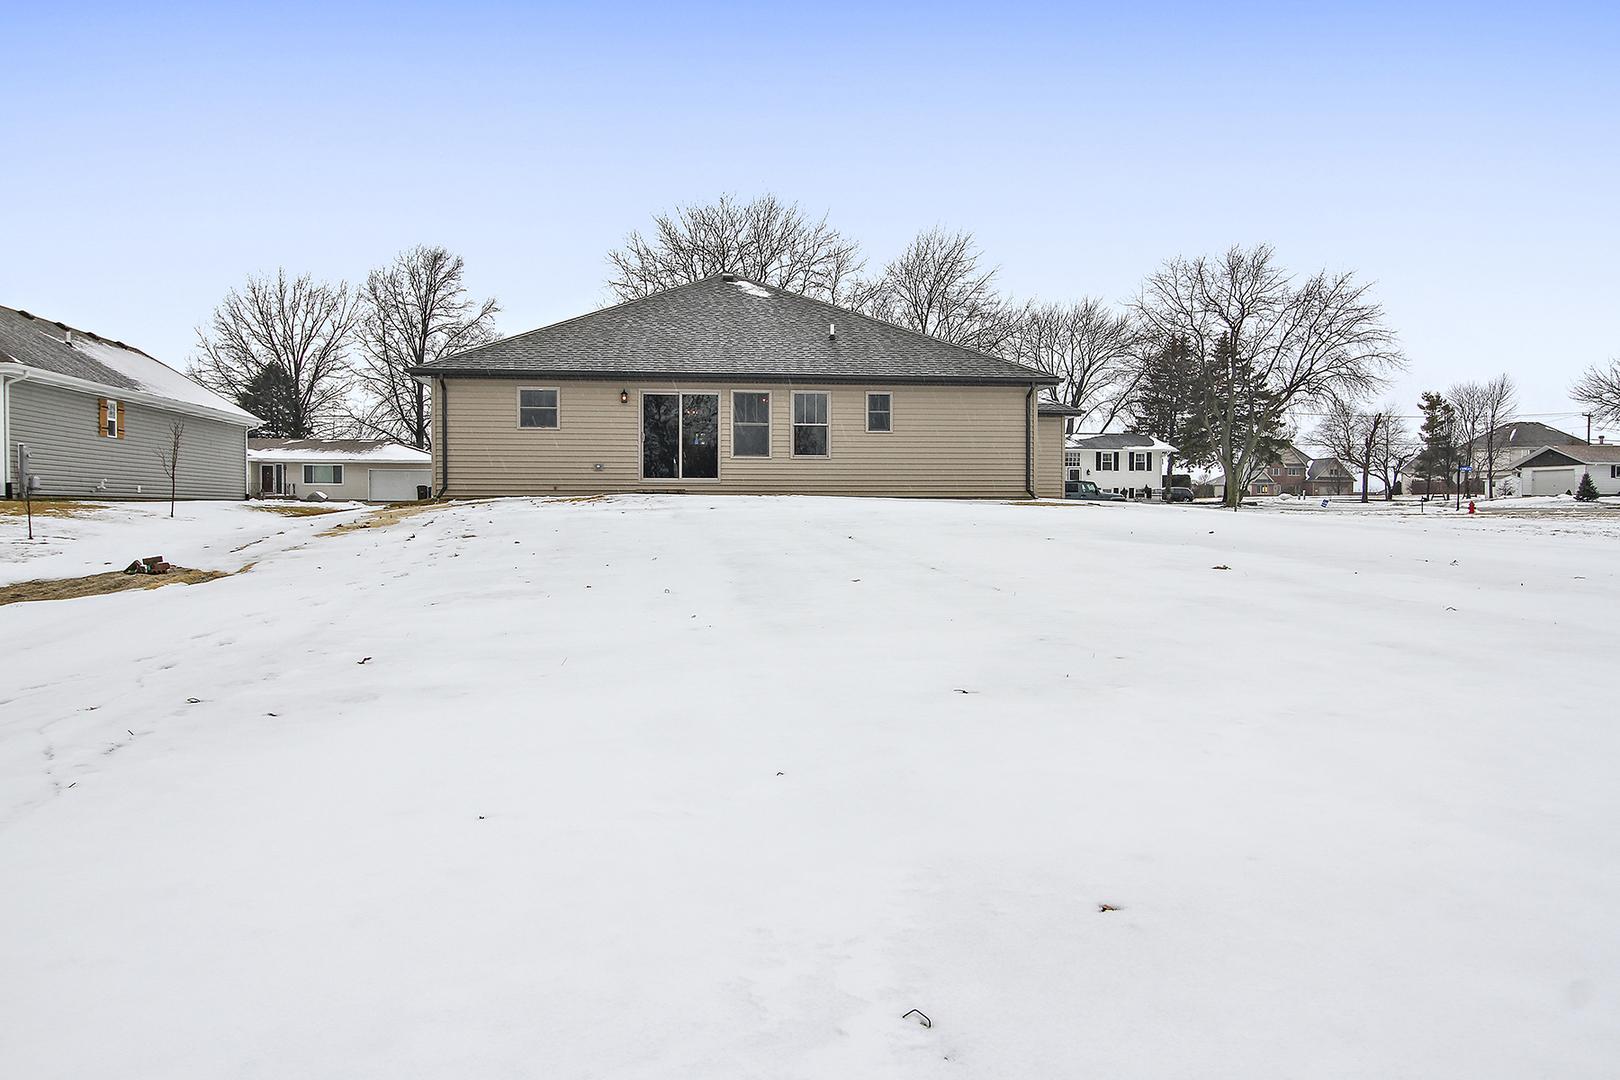 309 South Rathje, Peotone, Illinois, 60468